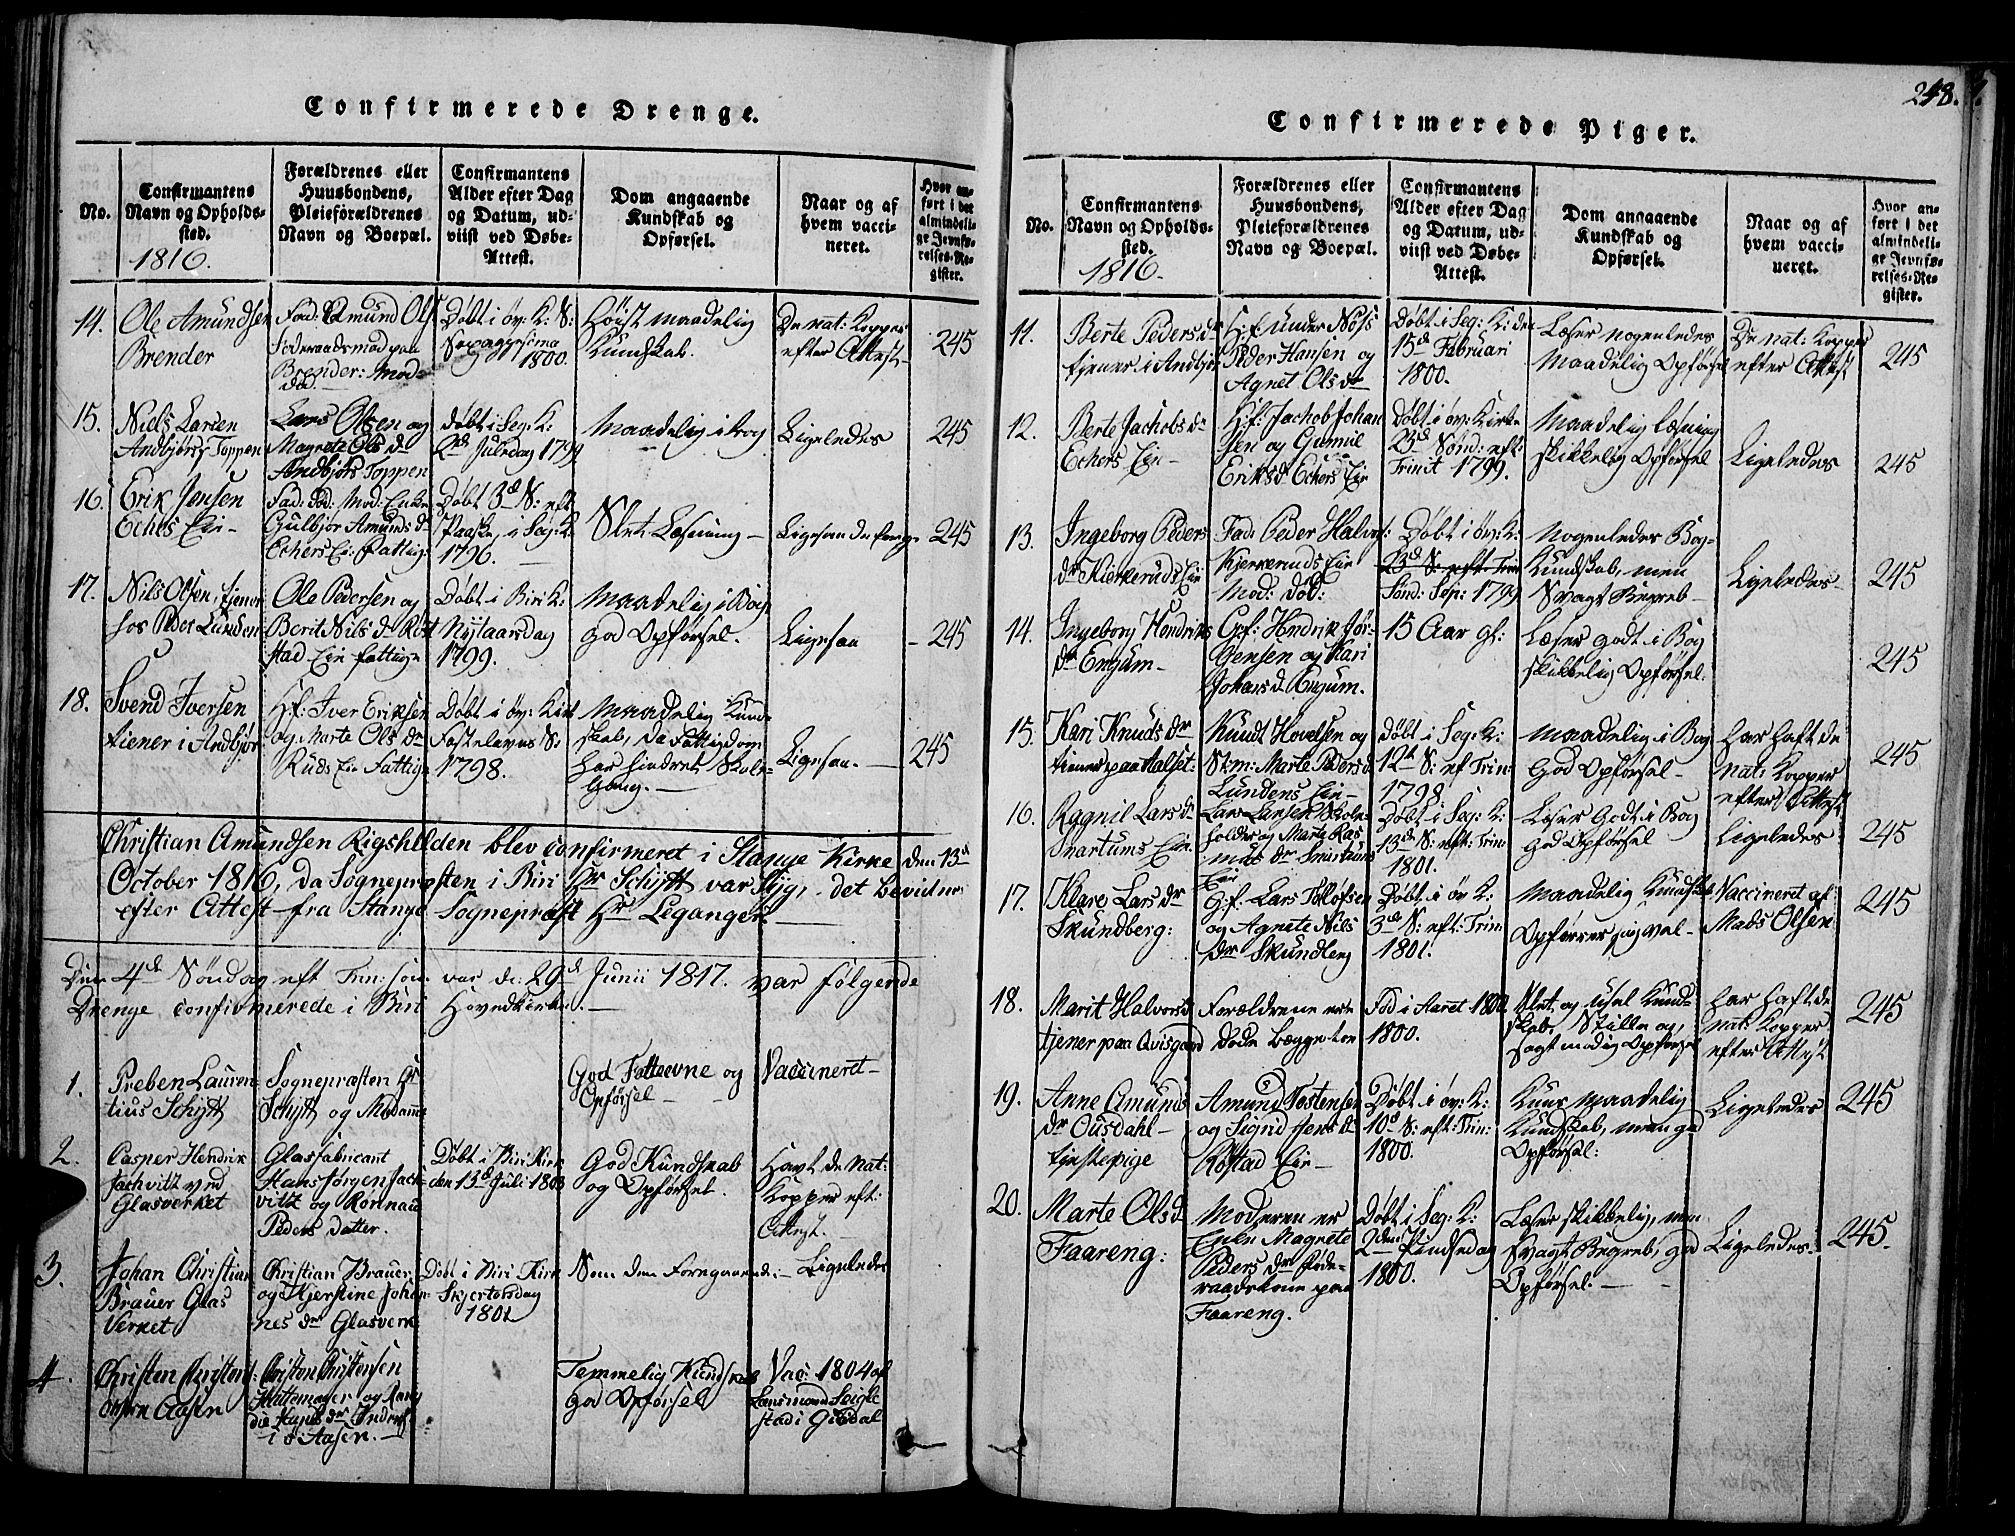 SAH, Biri prestekontor, Ministerialbok nr. 3, 1814-1828, s. 248